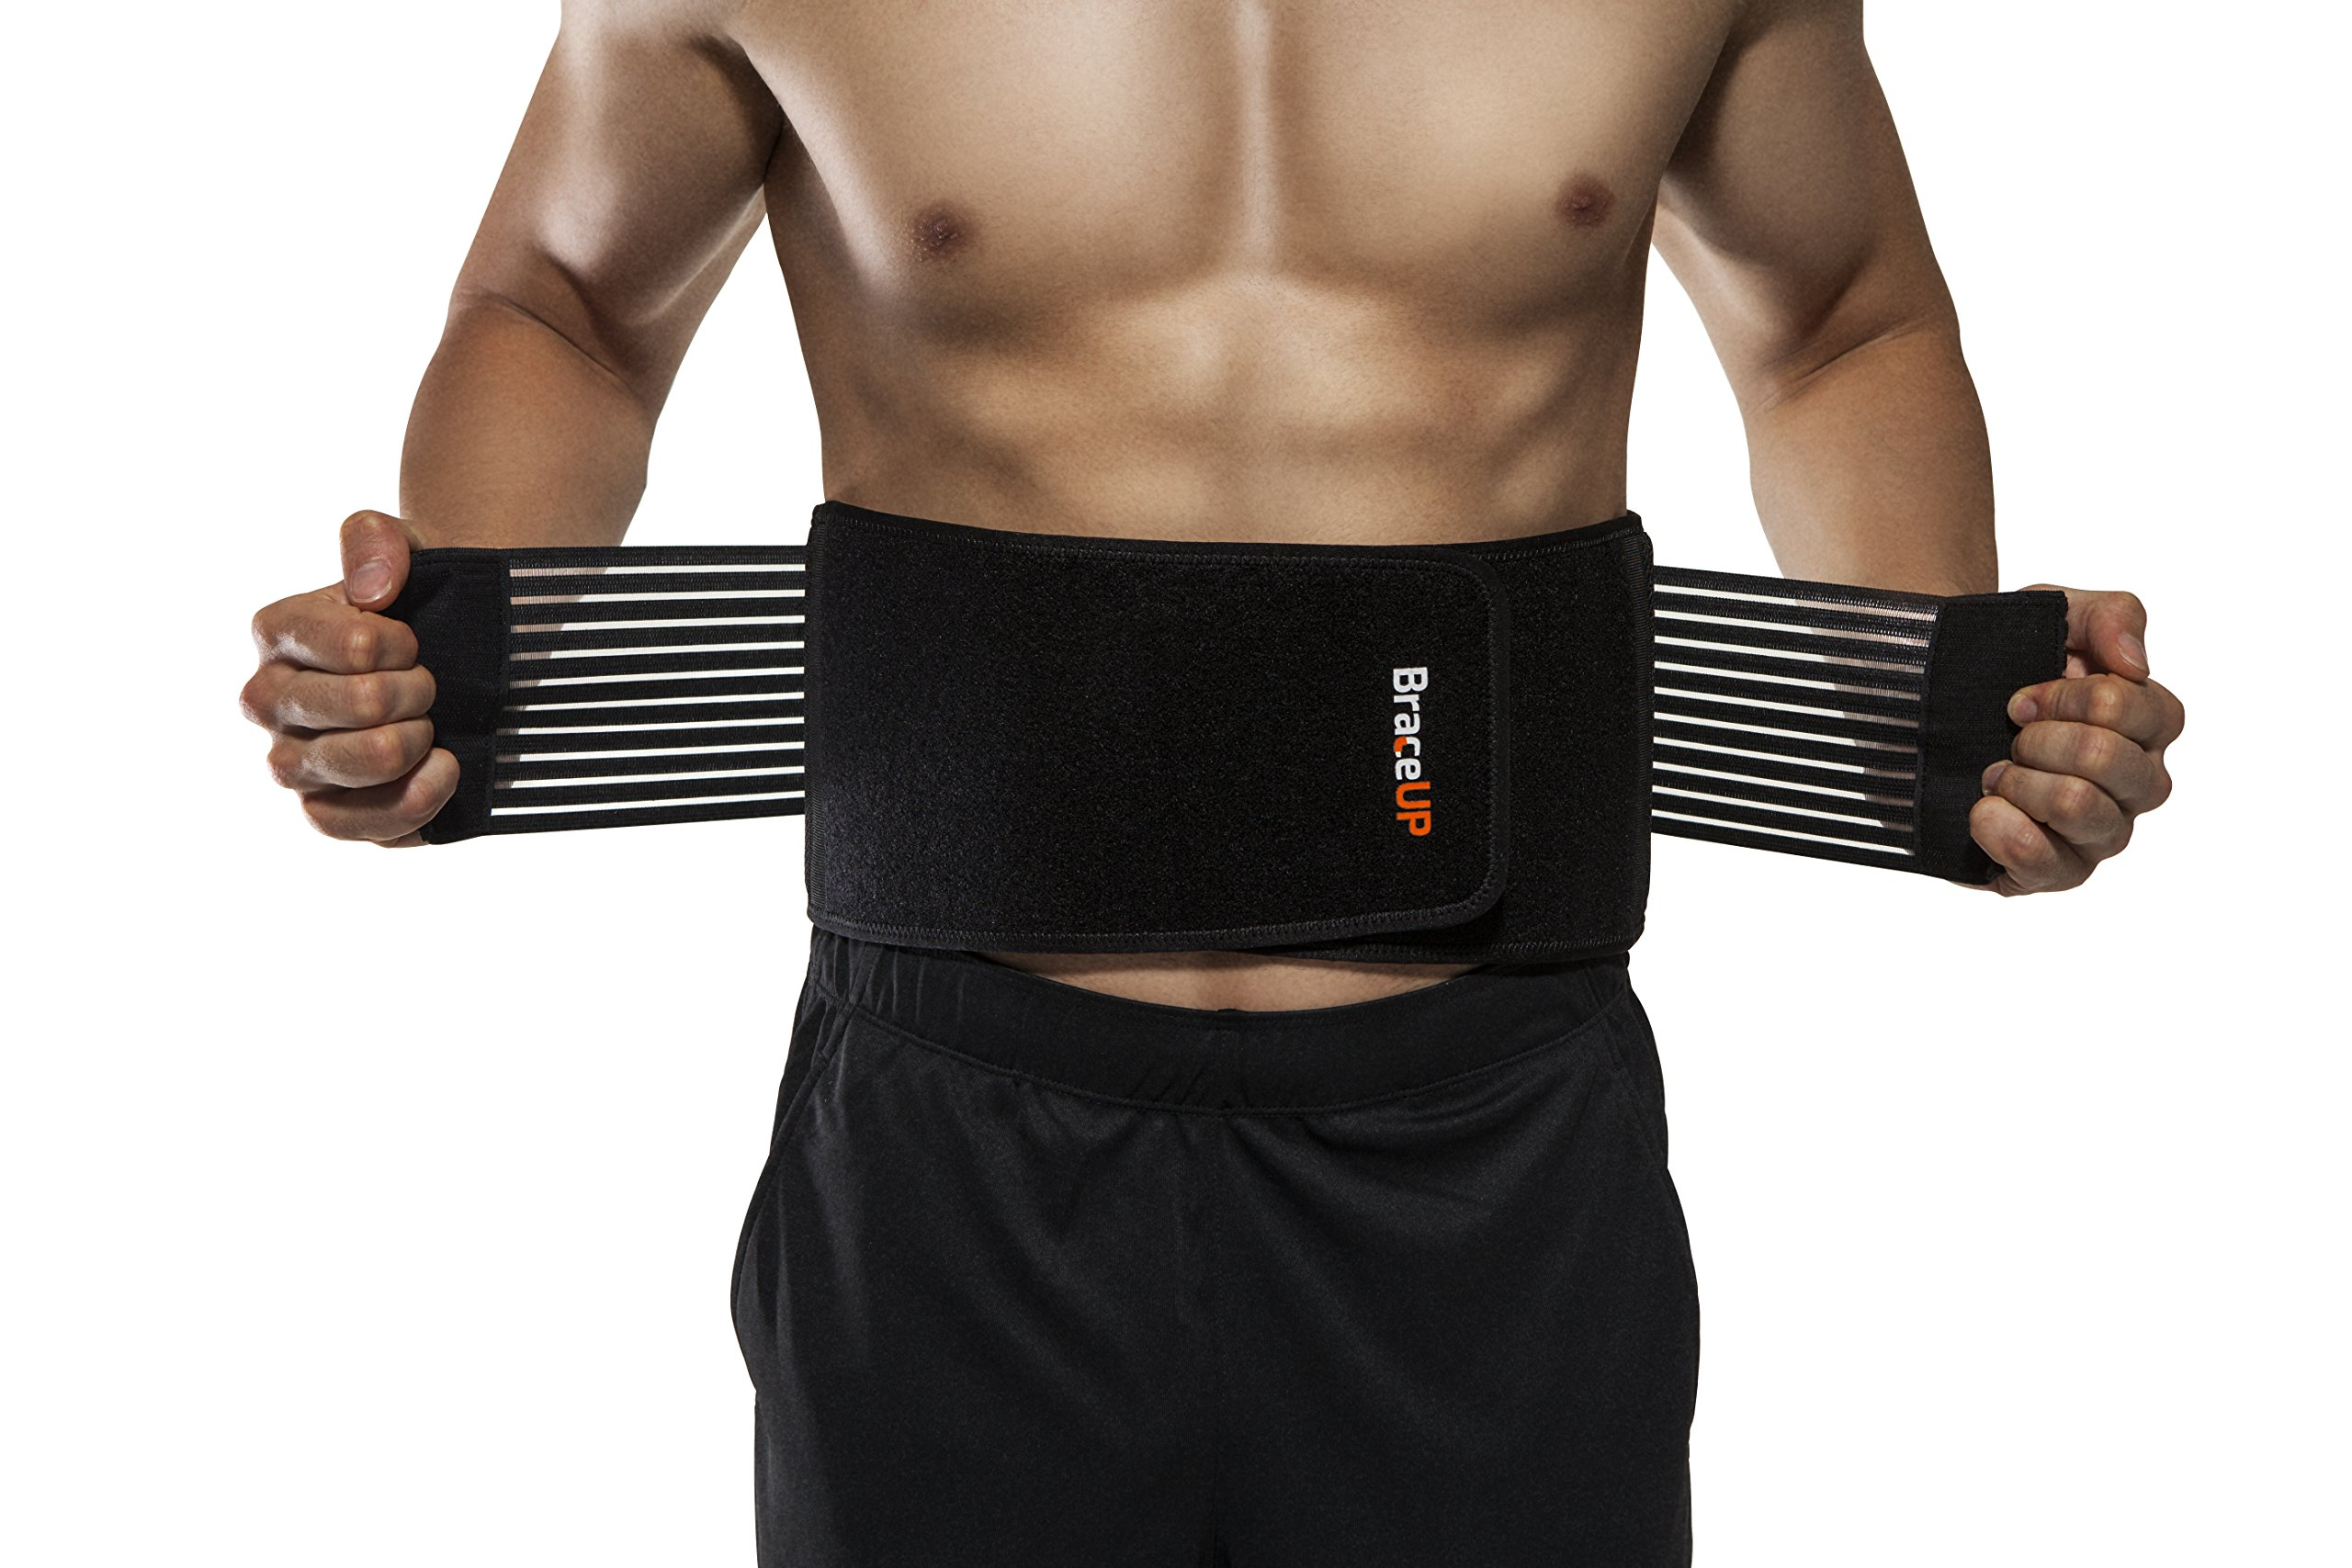 BraceUP Stabilizing Lumbar Lower Back Brace Support Belt Dual Adjustable Straps Breathable Mesh Panels (XXL) by BraceUP